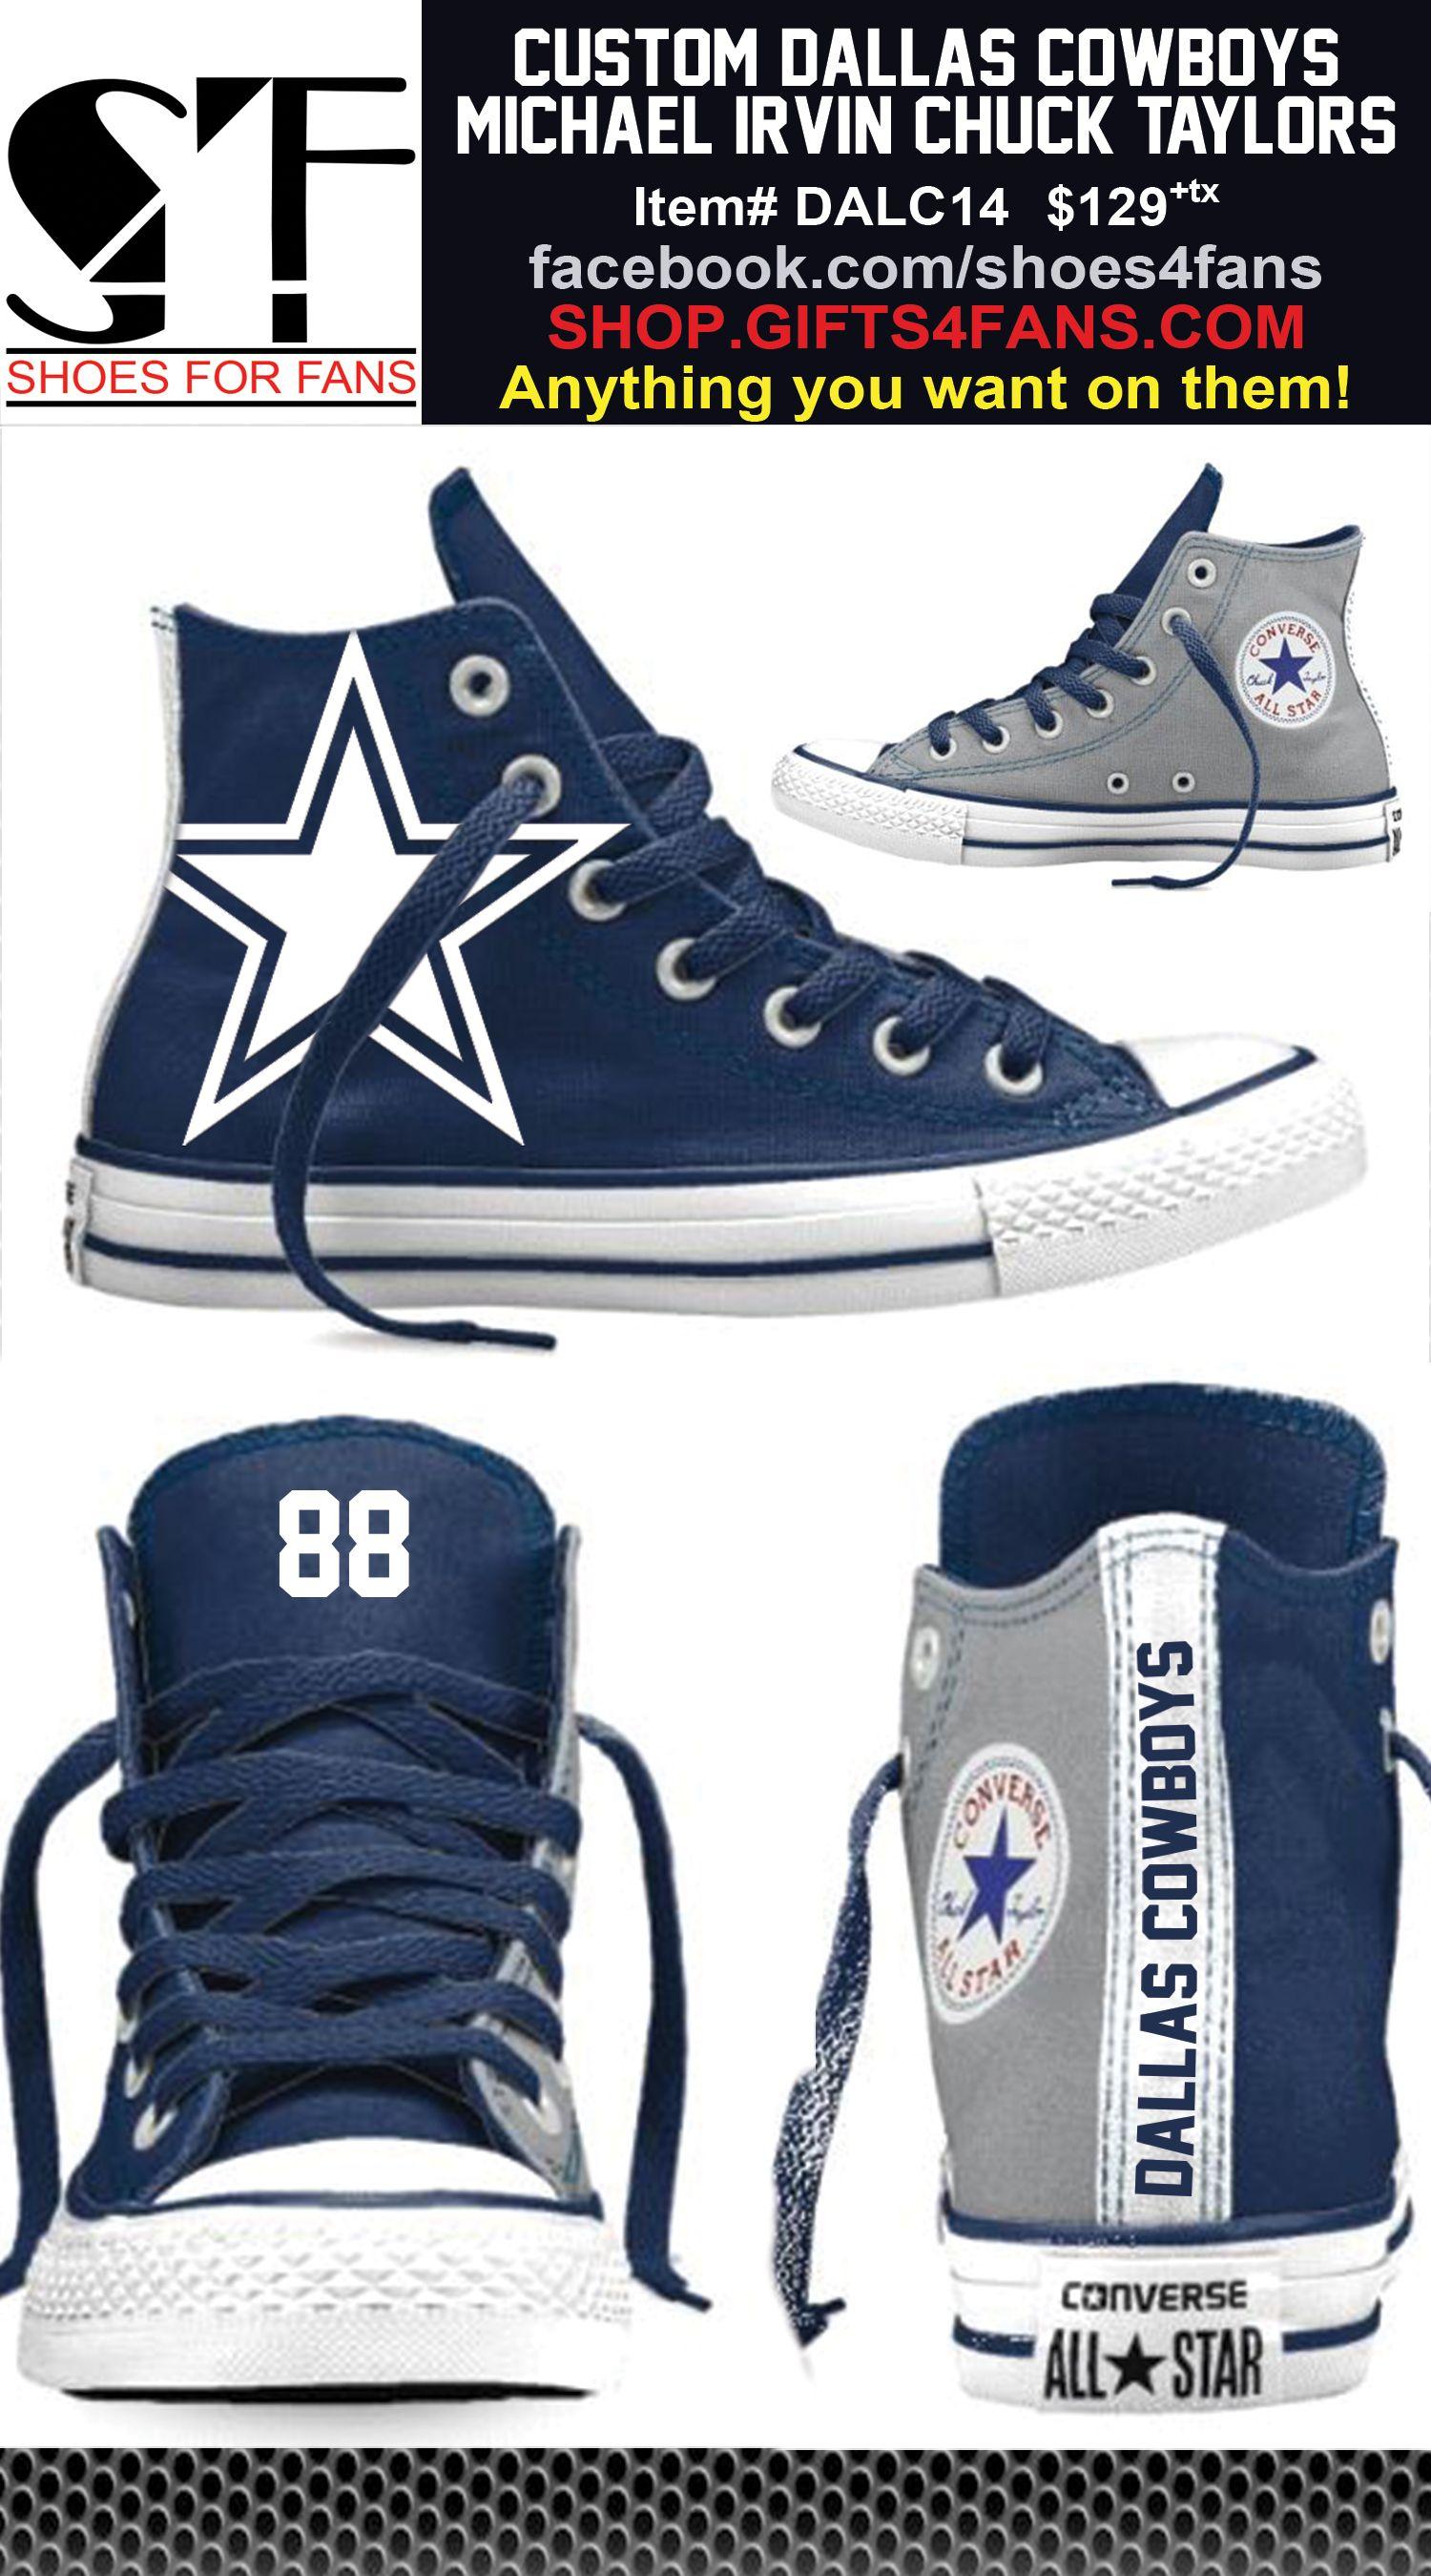 Custom Dallas Cowboys Dez Bryant 88 Converse Shoes Order at shop